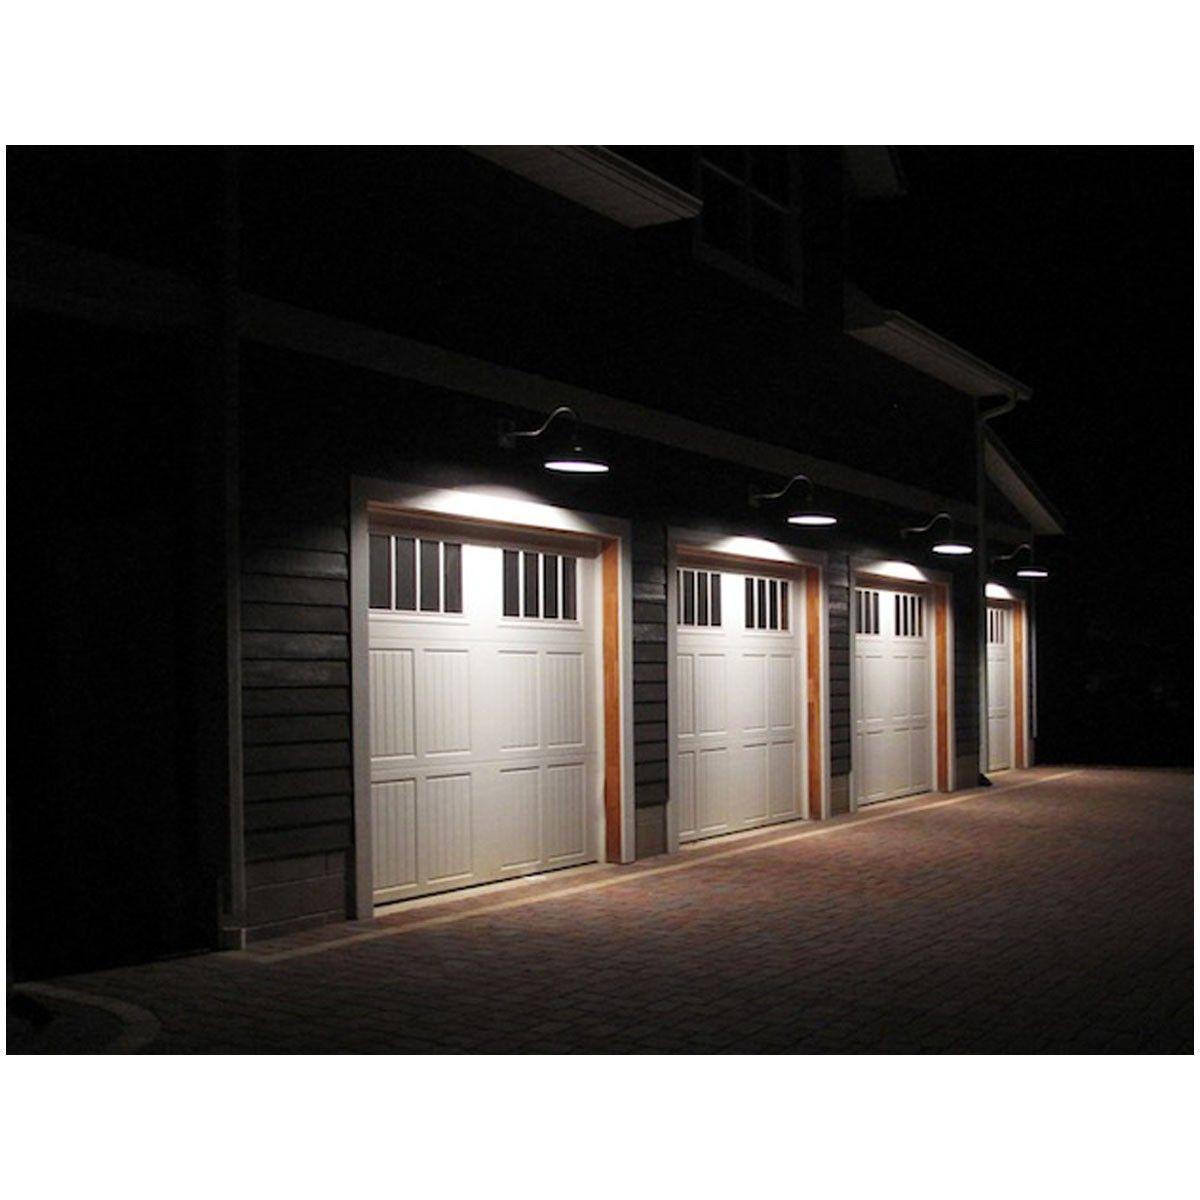 14 Satin Black Aluminum Modified Warehouse Shade With Gooseneck Farmhouse Lighting Farmhouse Outdoor Lighting Garage Lighting